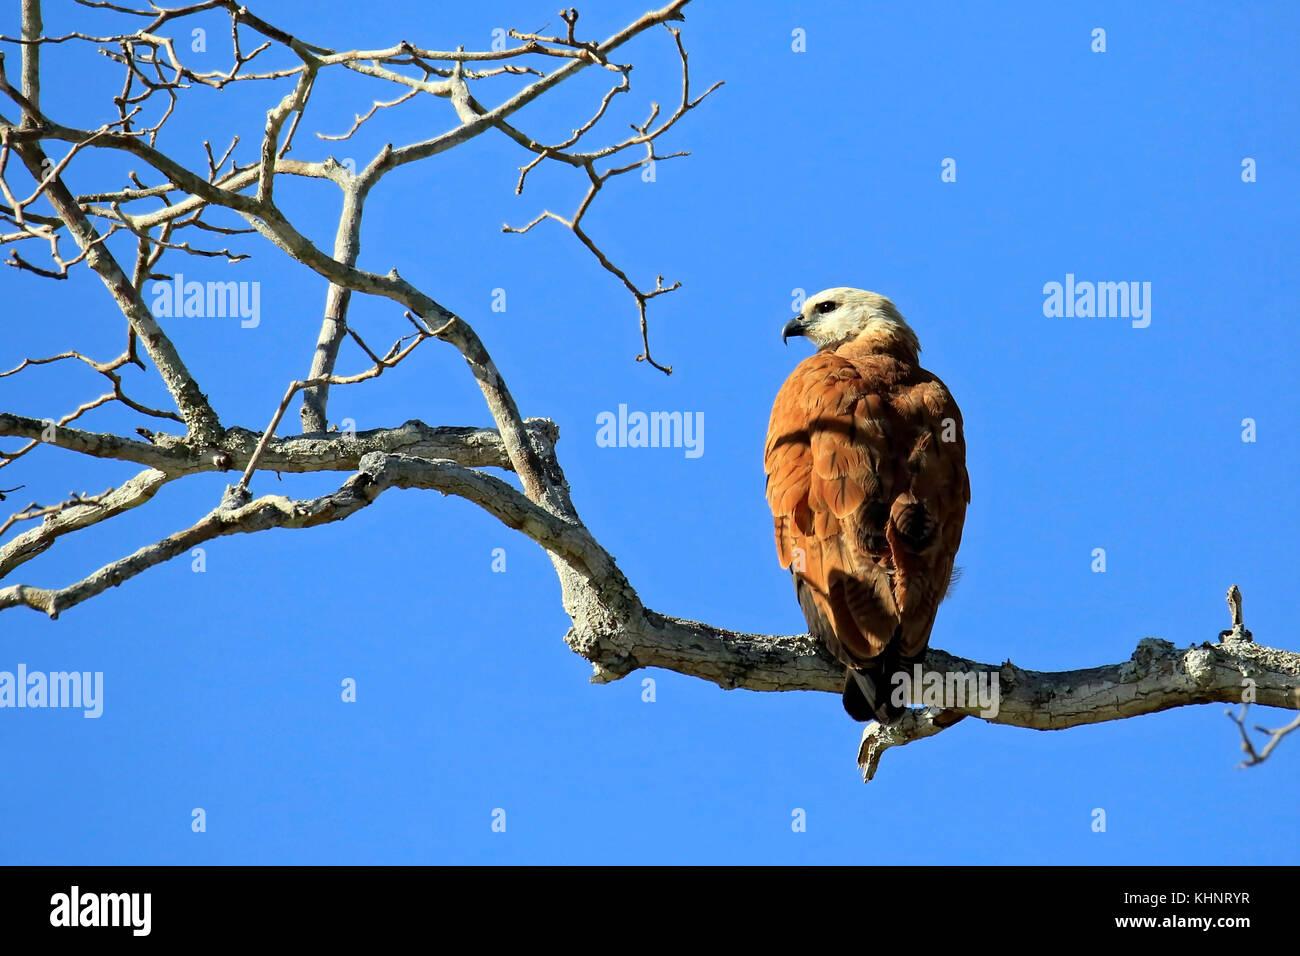 Black-collared Hawk in Profile, on a Branch. Rio Claro, Pantanal, Brazil - Stock Image